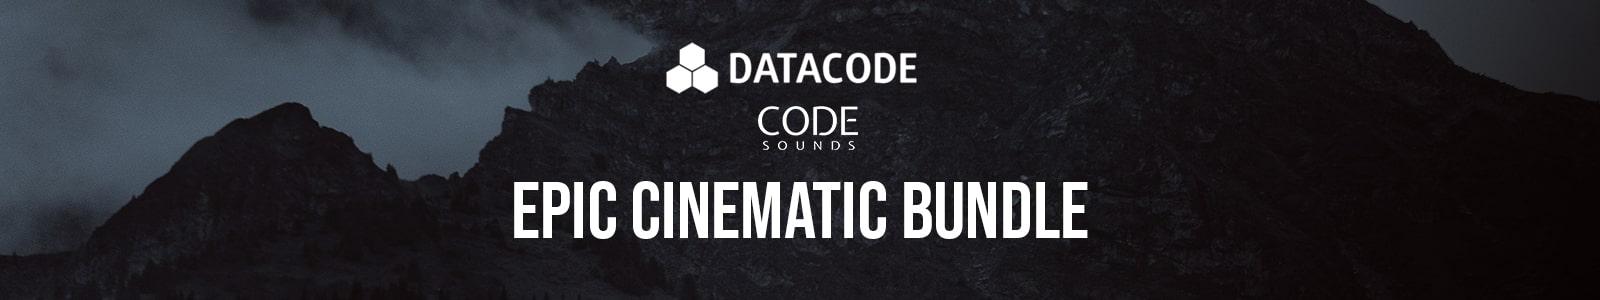 epic cinematic bundle